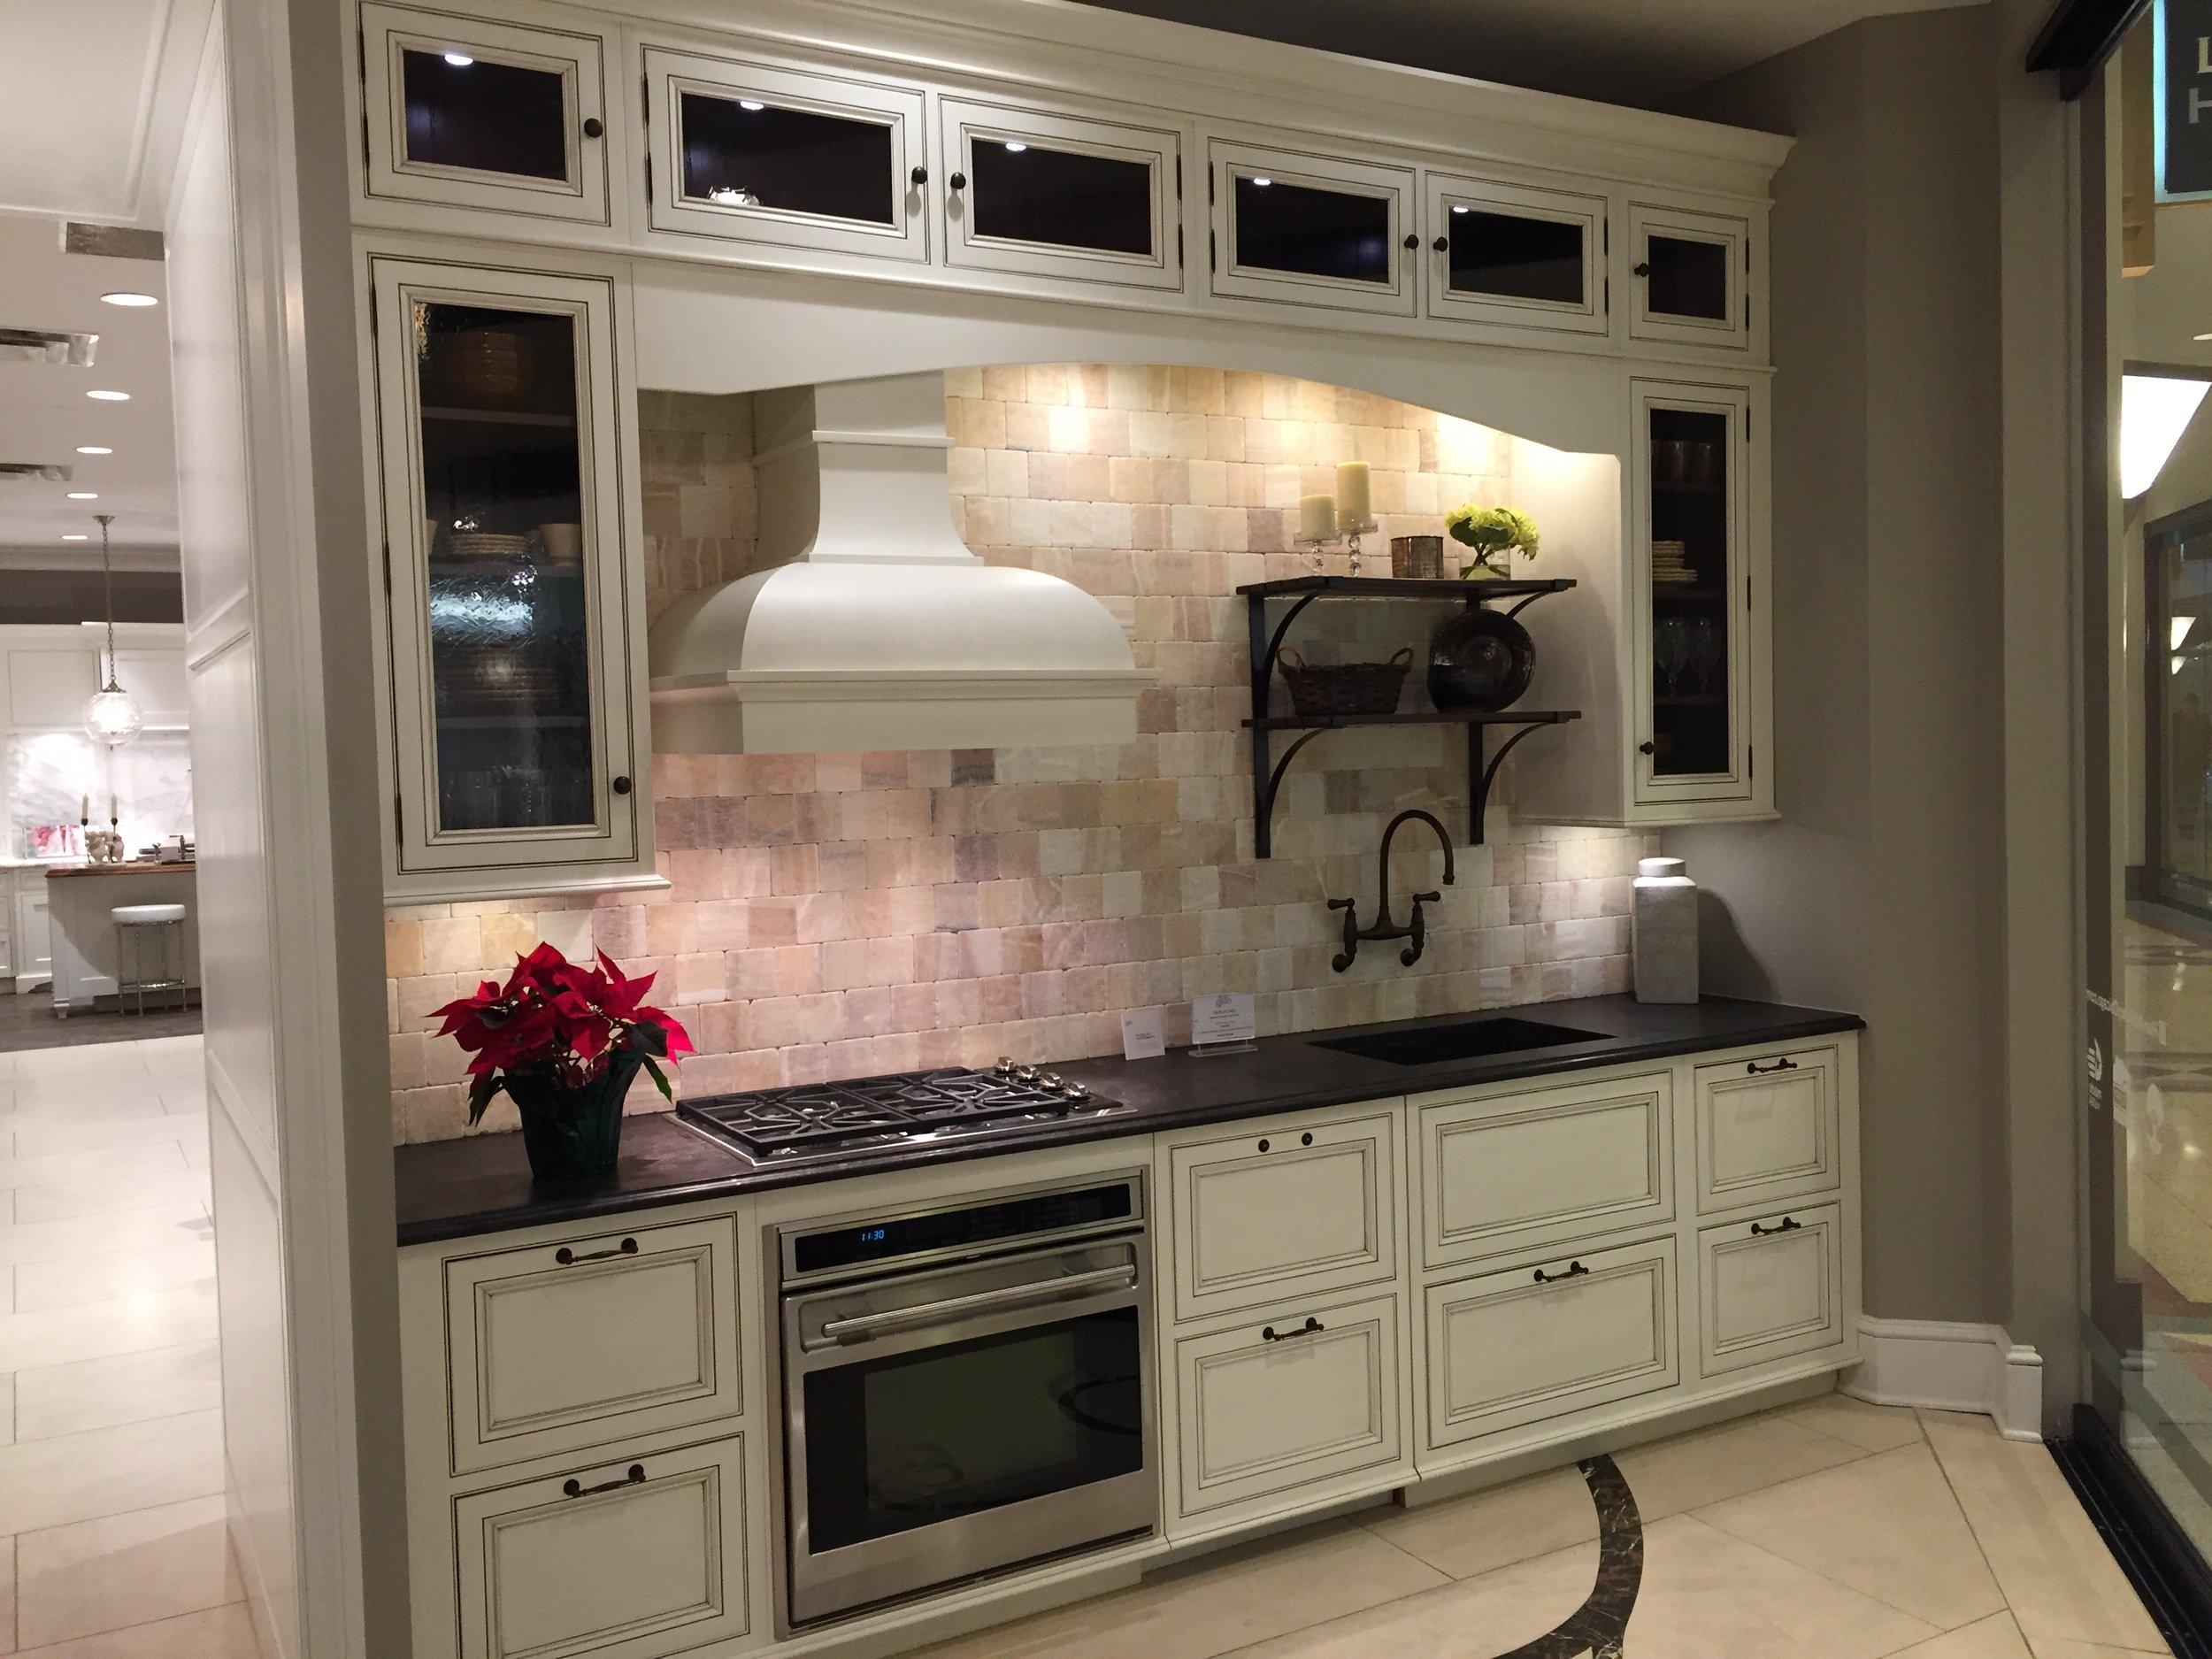 NEW Plain & Fancy White Inset Kitchen Cabinets Complete Subzero Wolf —  Little Green Kitchens